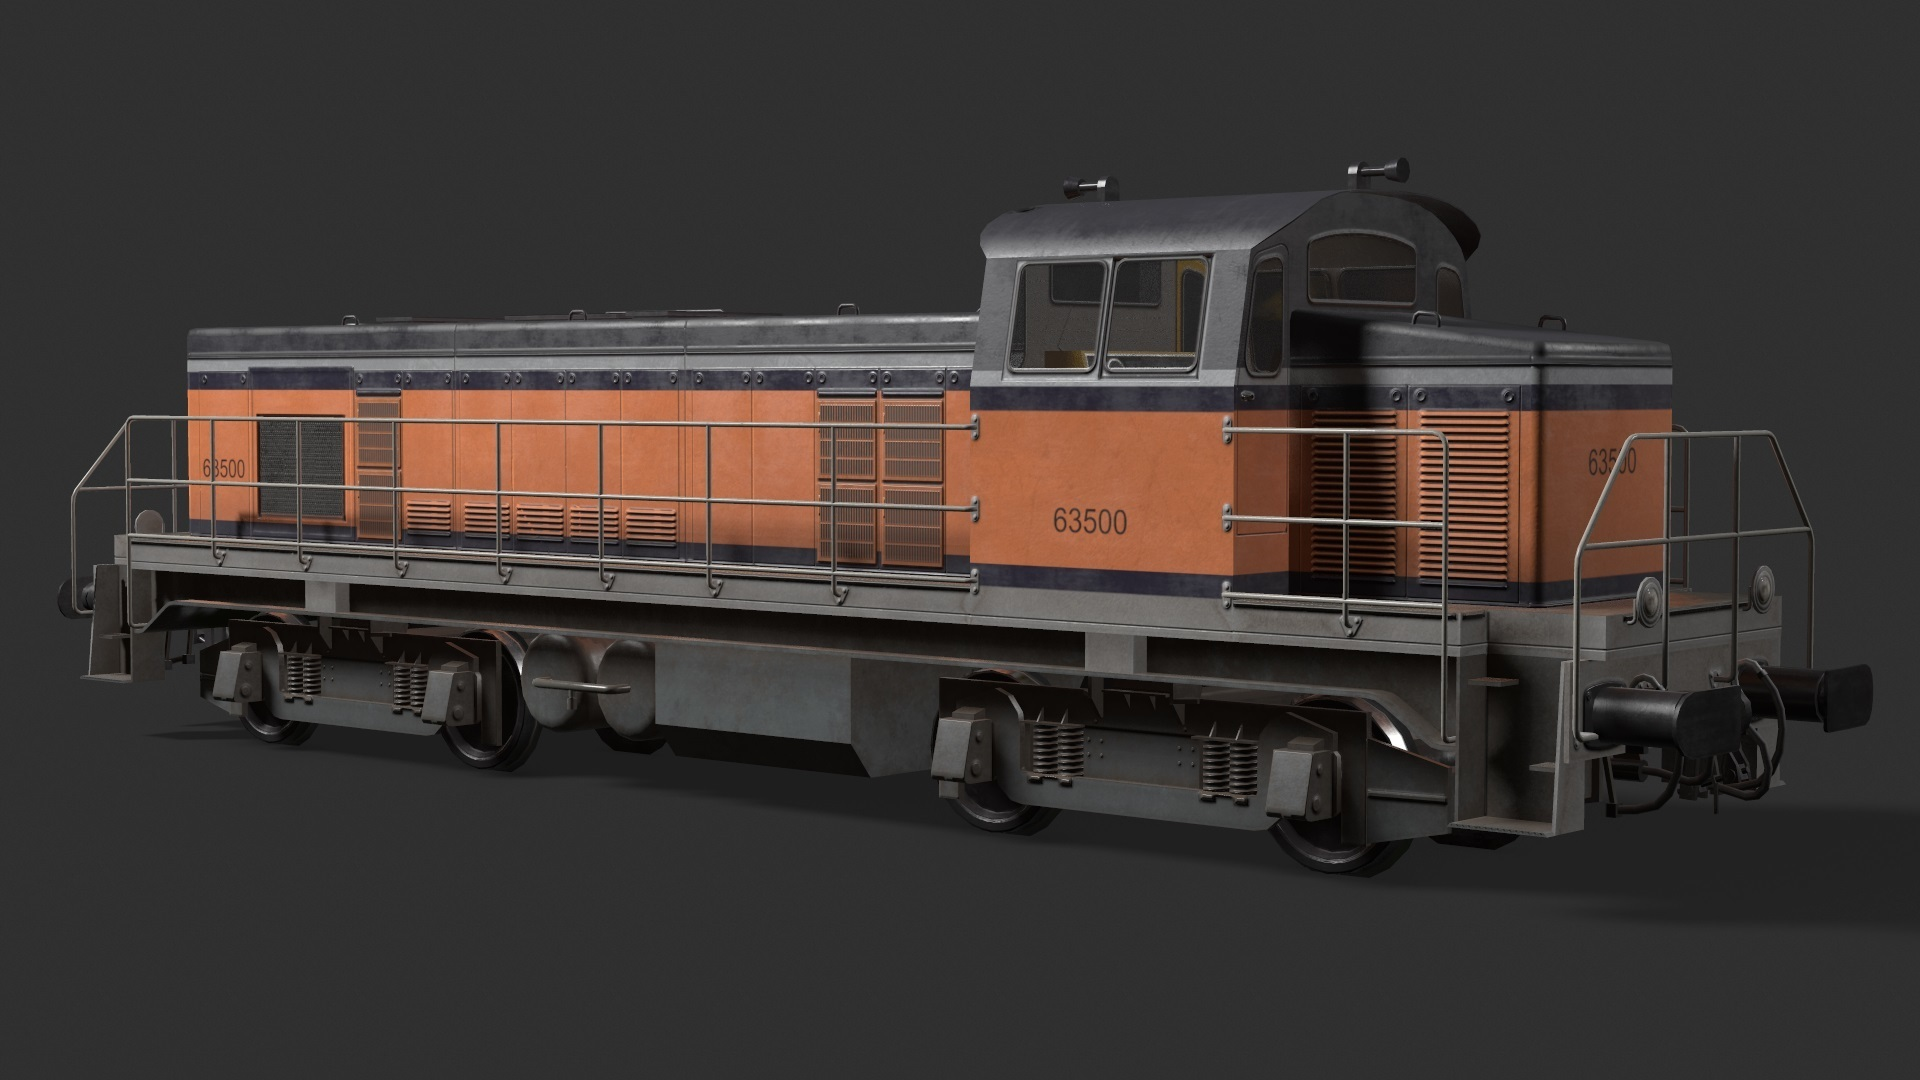 SNCF_BB63500_2.thumb.jpg.5449ef763ce721af551c903f88297505.jpg